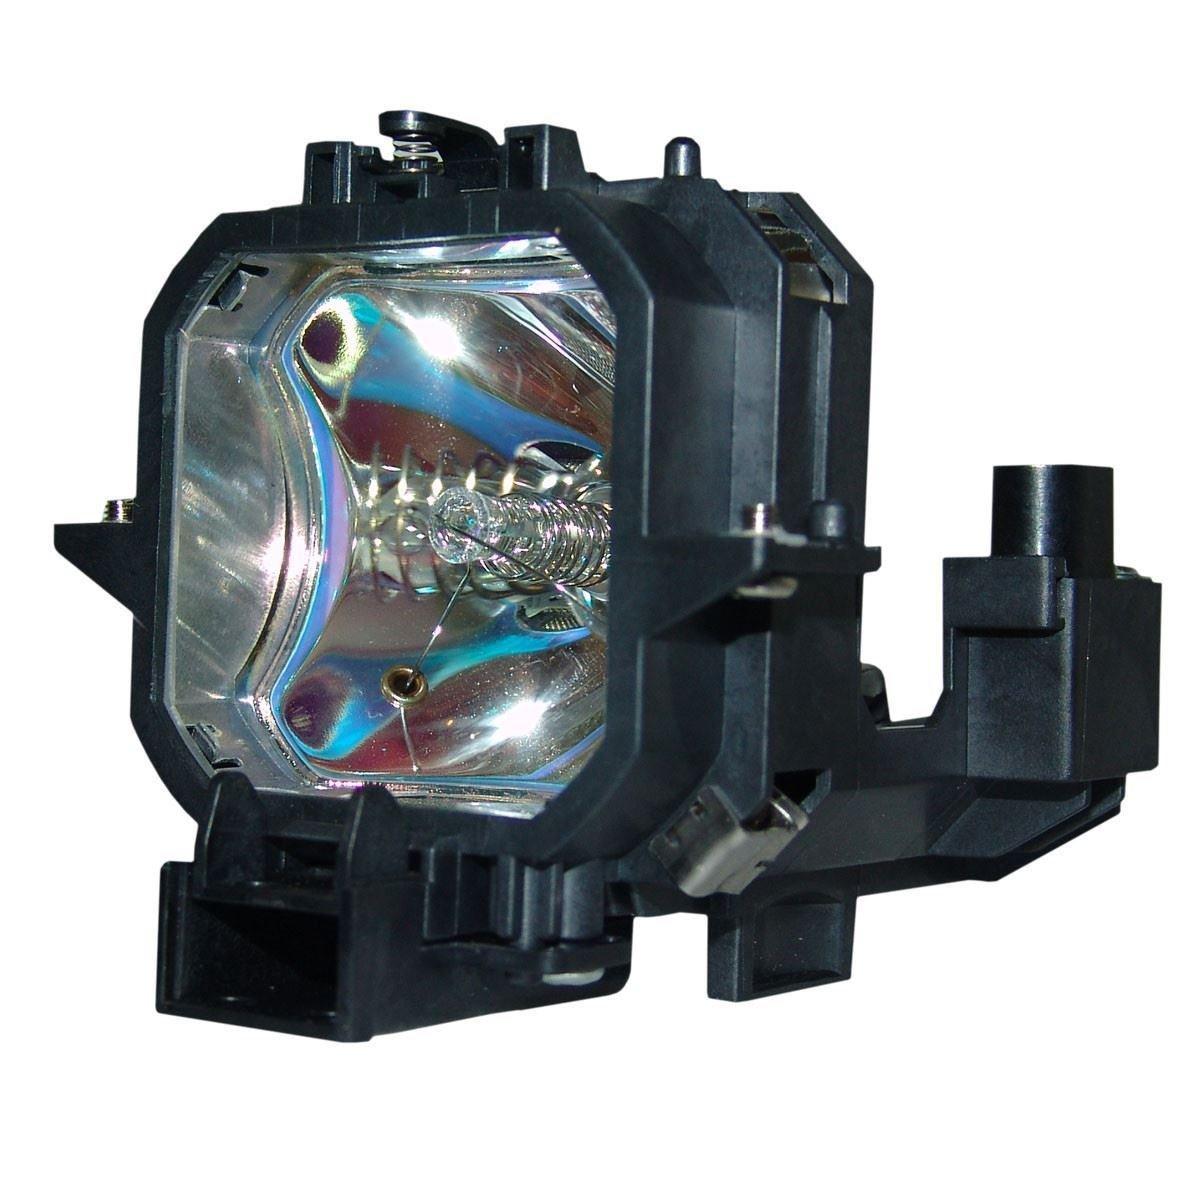 30%OFF CTLAMP - Recambio de bombilla de proyector, con ranura para EMP-